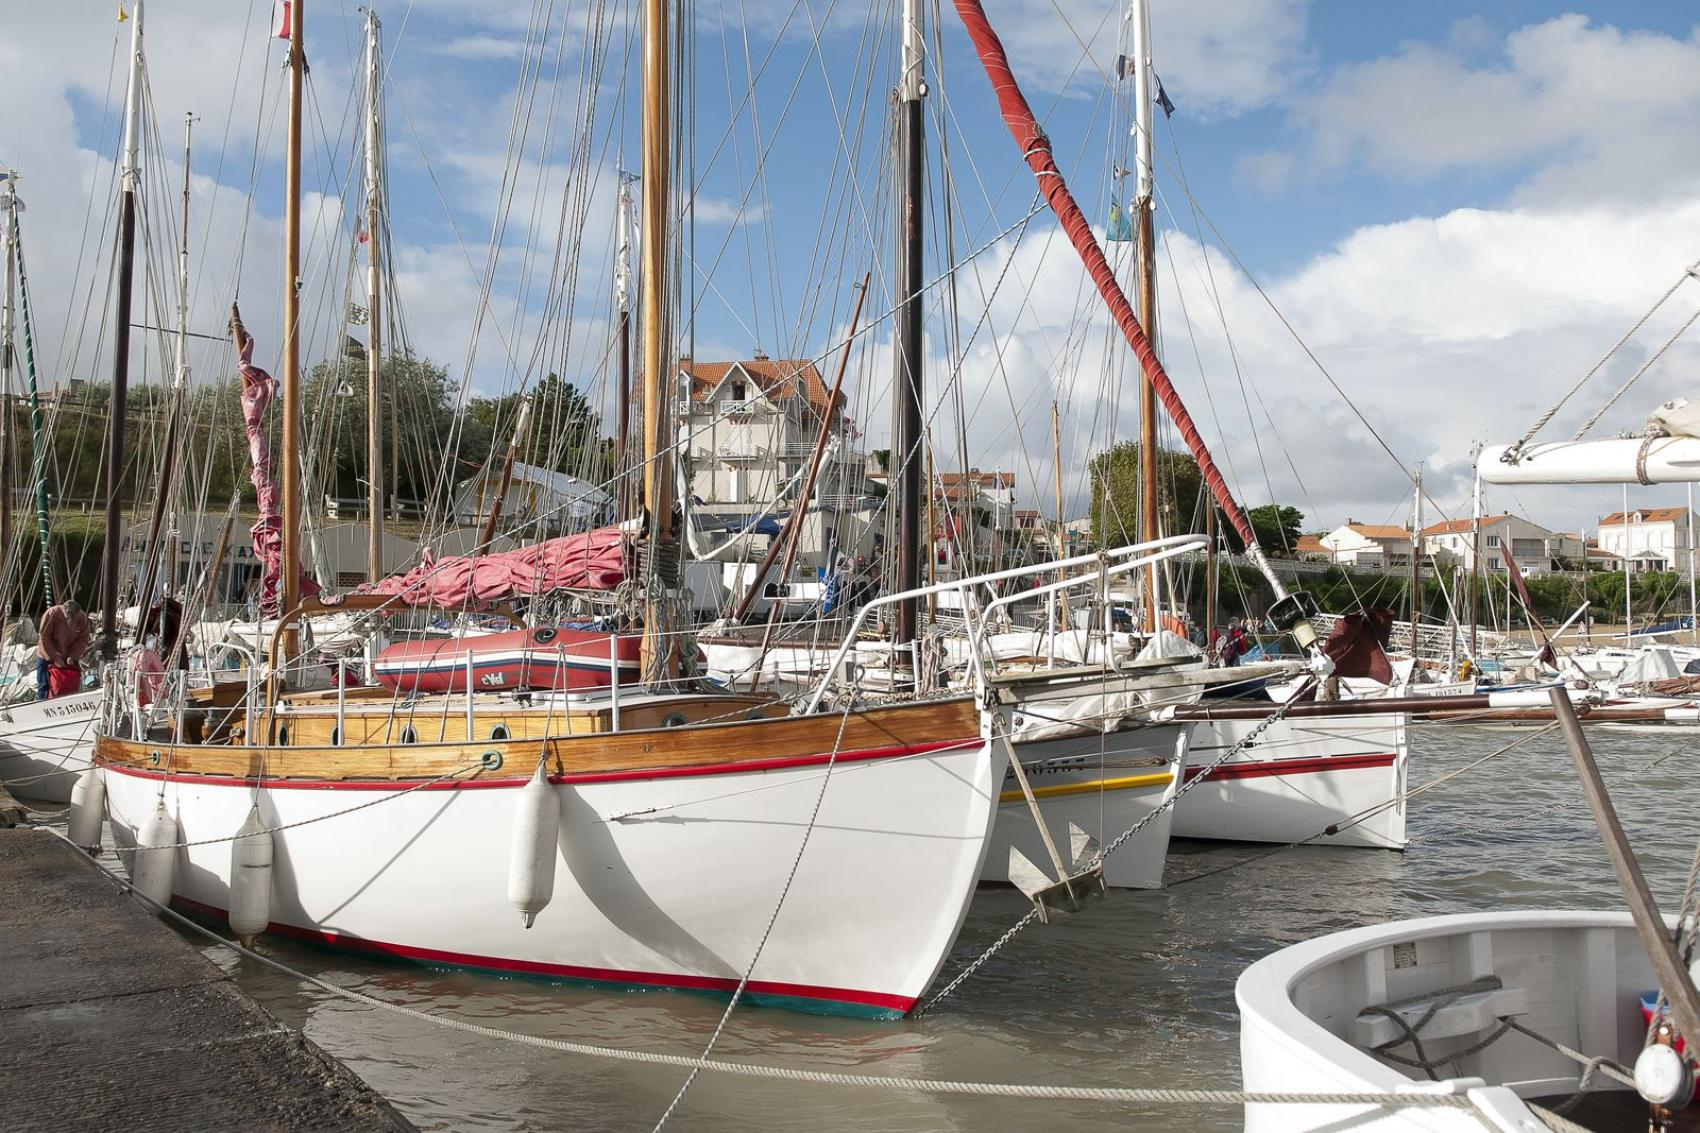 Cerca de las islas de r aix and ol ron grand h tel des for Hotel des bains oleron